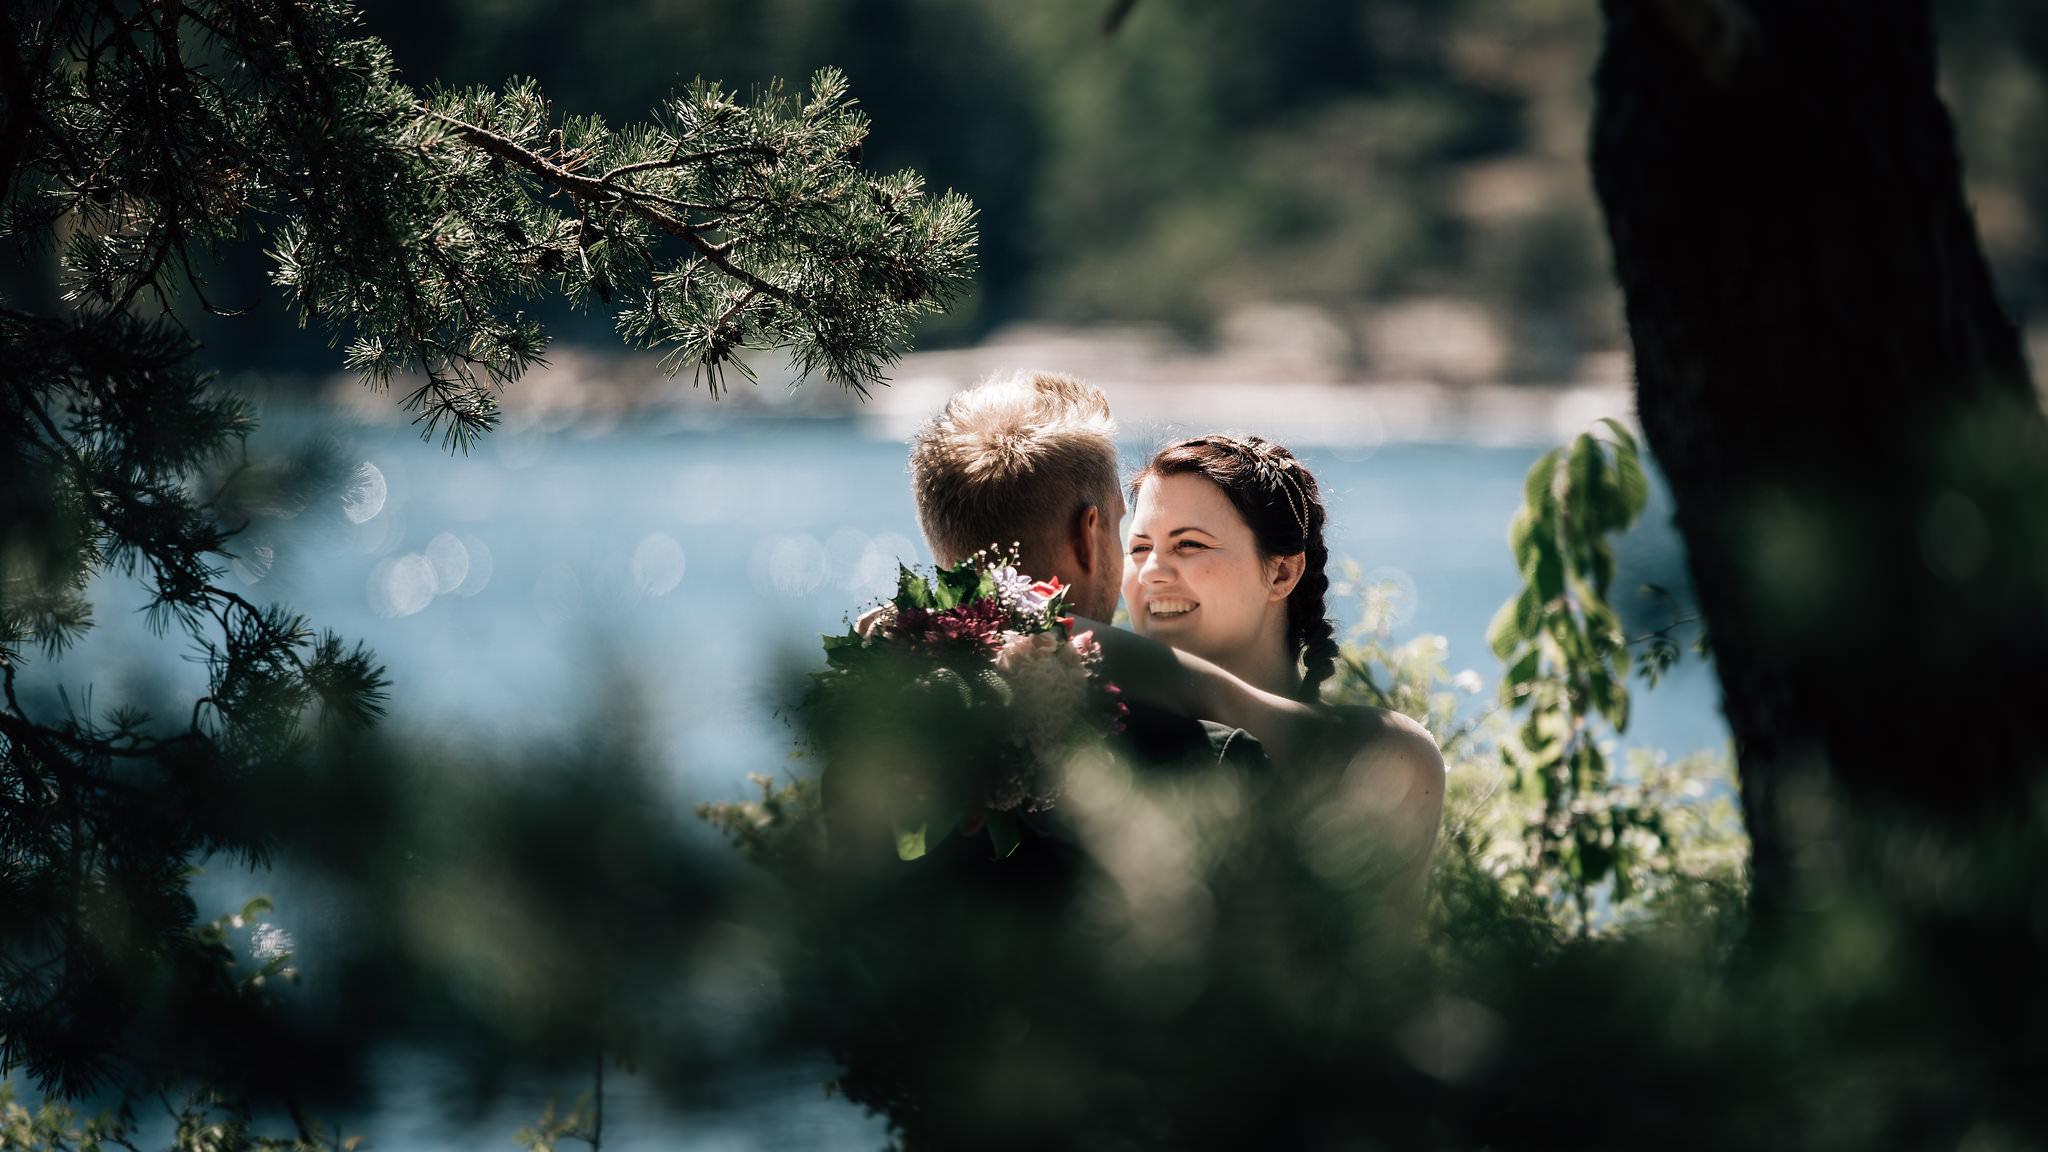 _N859890-fotograf-vestfold-bryllupsfotograf-.jpg